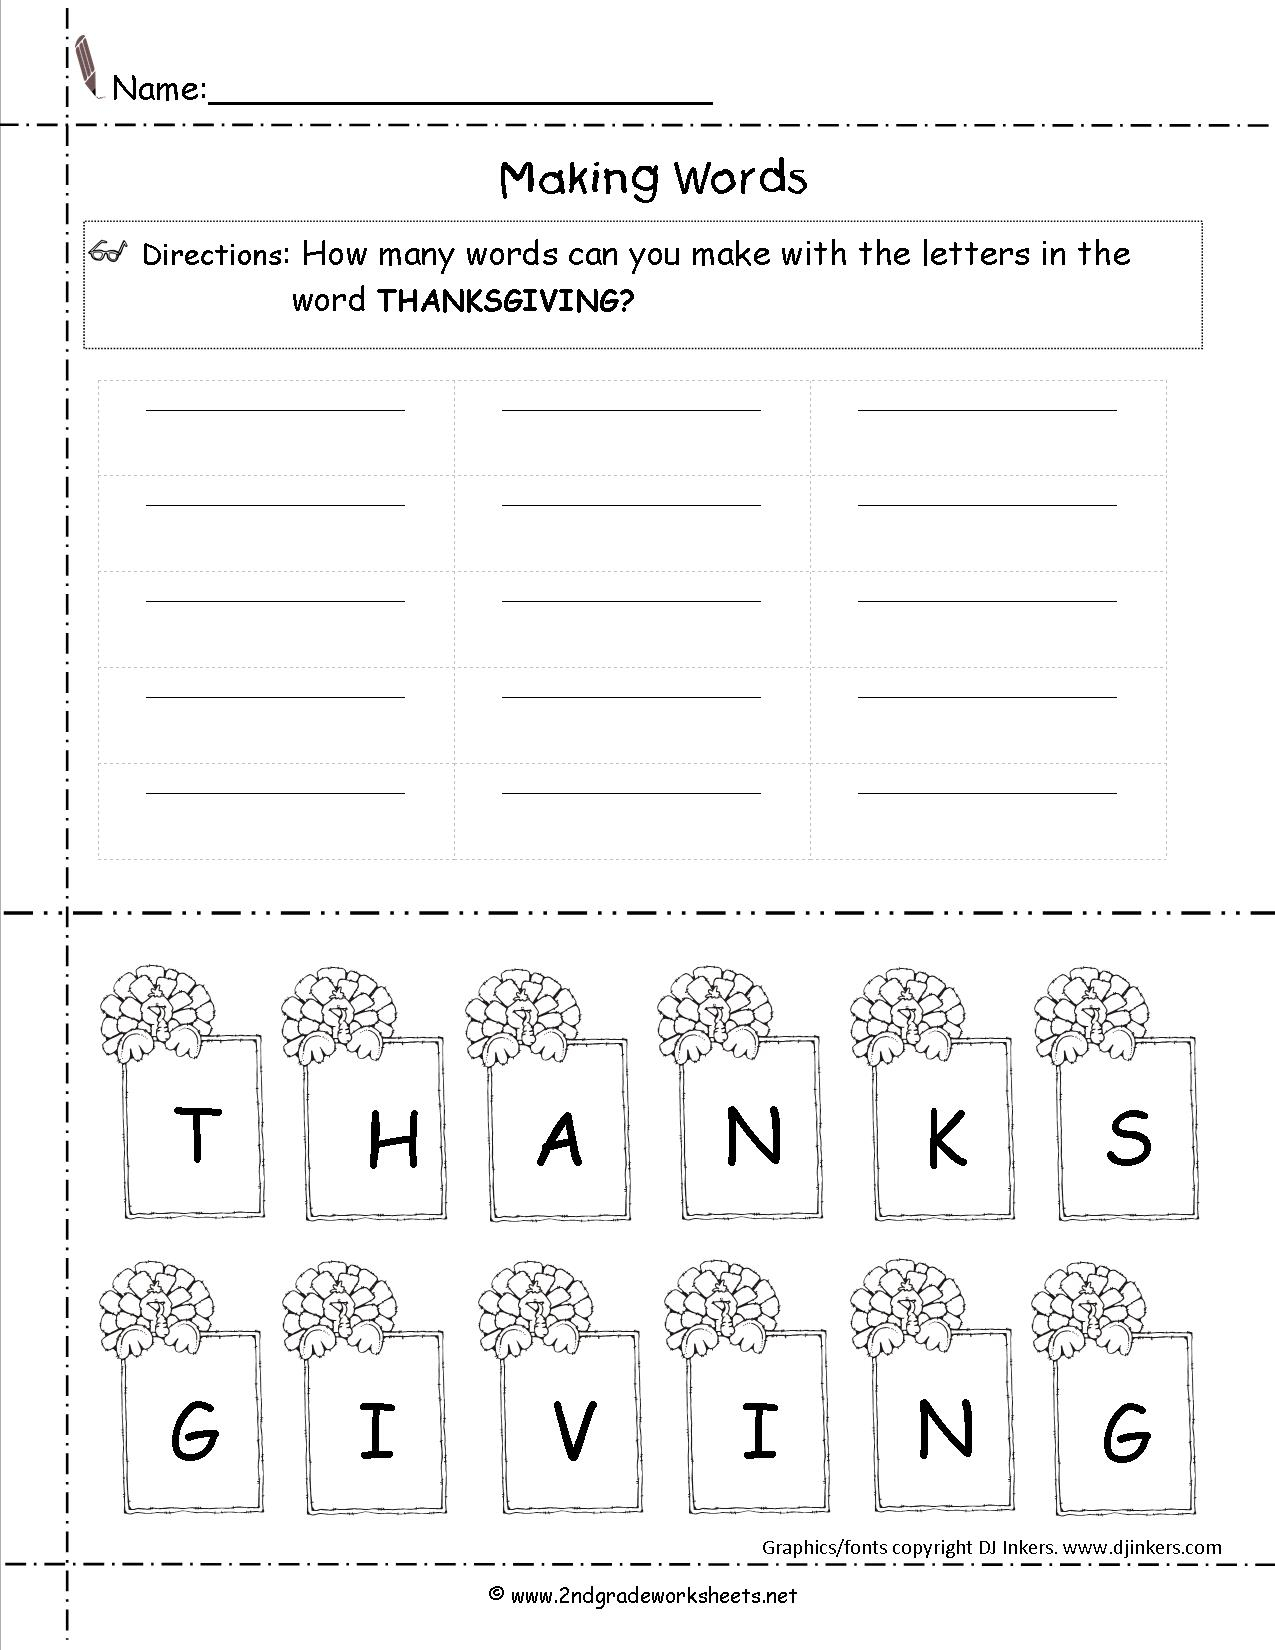 Thanksgiving Scramble Worksheets | Printable Worksheets And